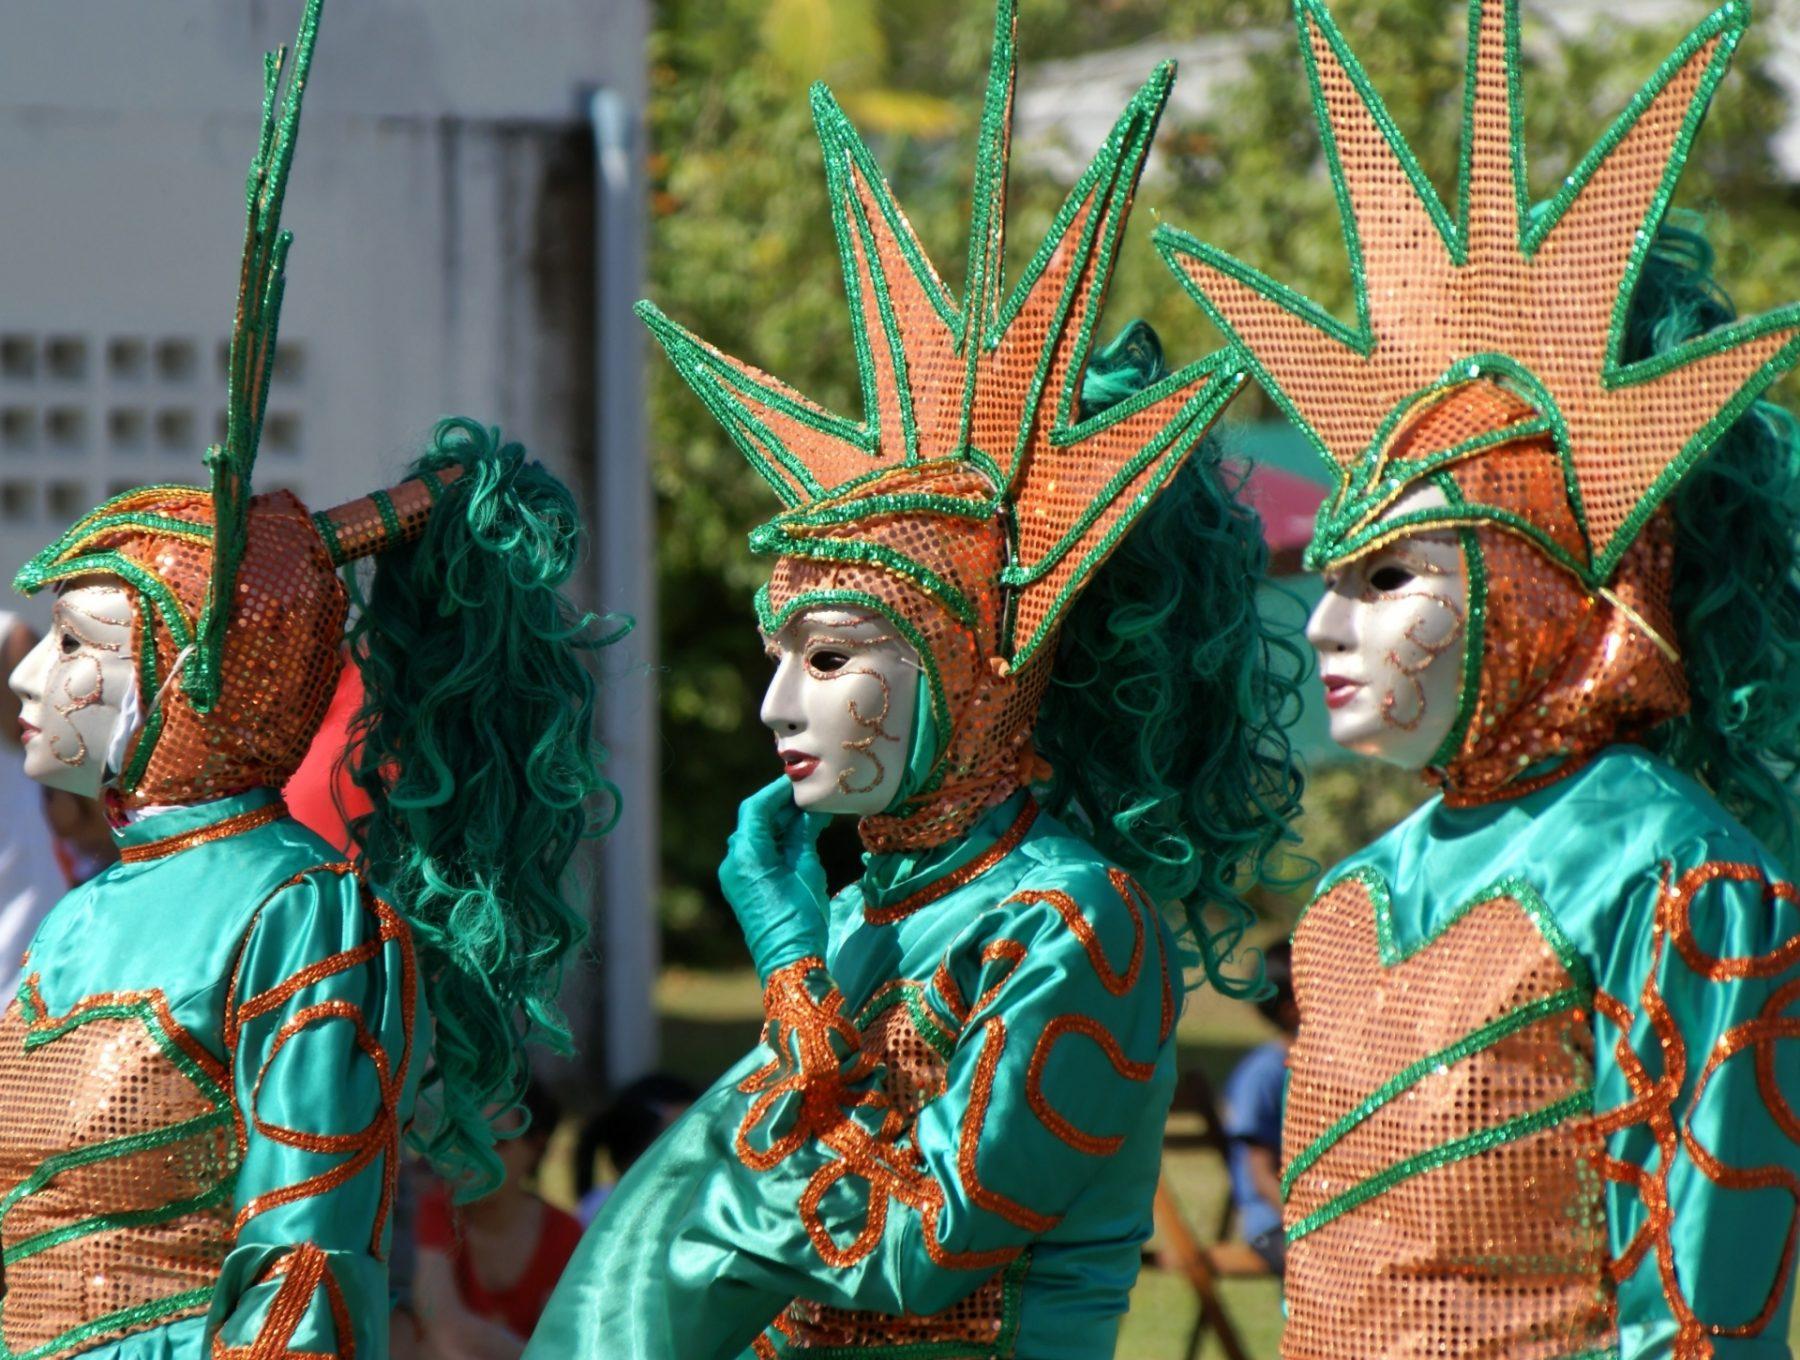 Carnevale nel mondo Caraibi